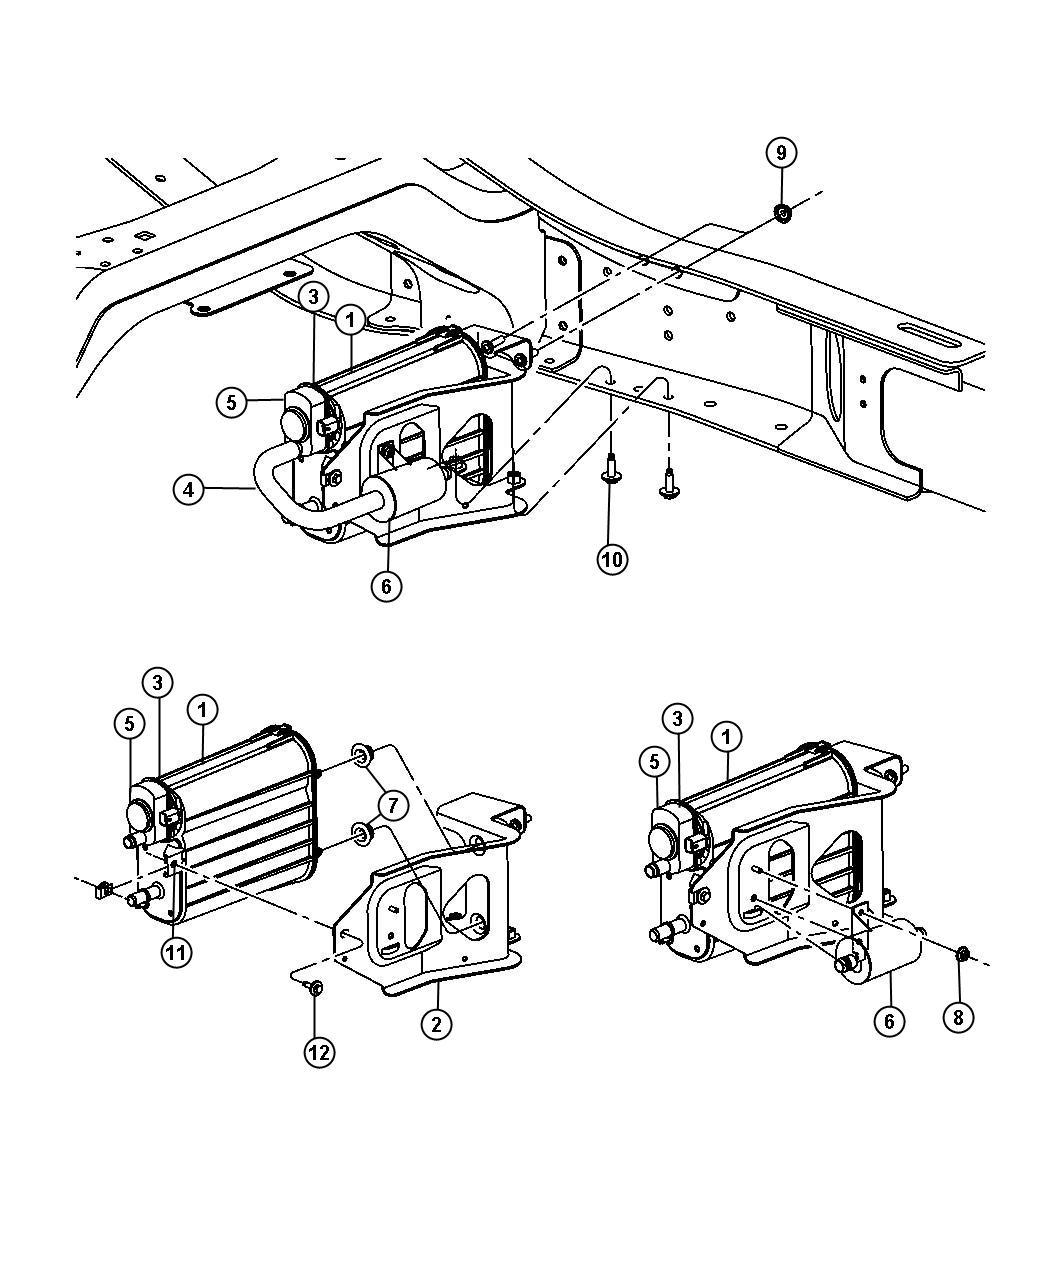 Dodge Ram Bracket Vapor Canister Leak Vacuum